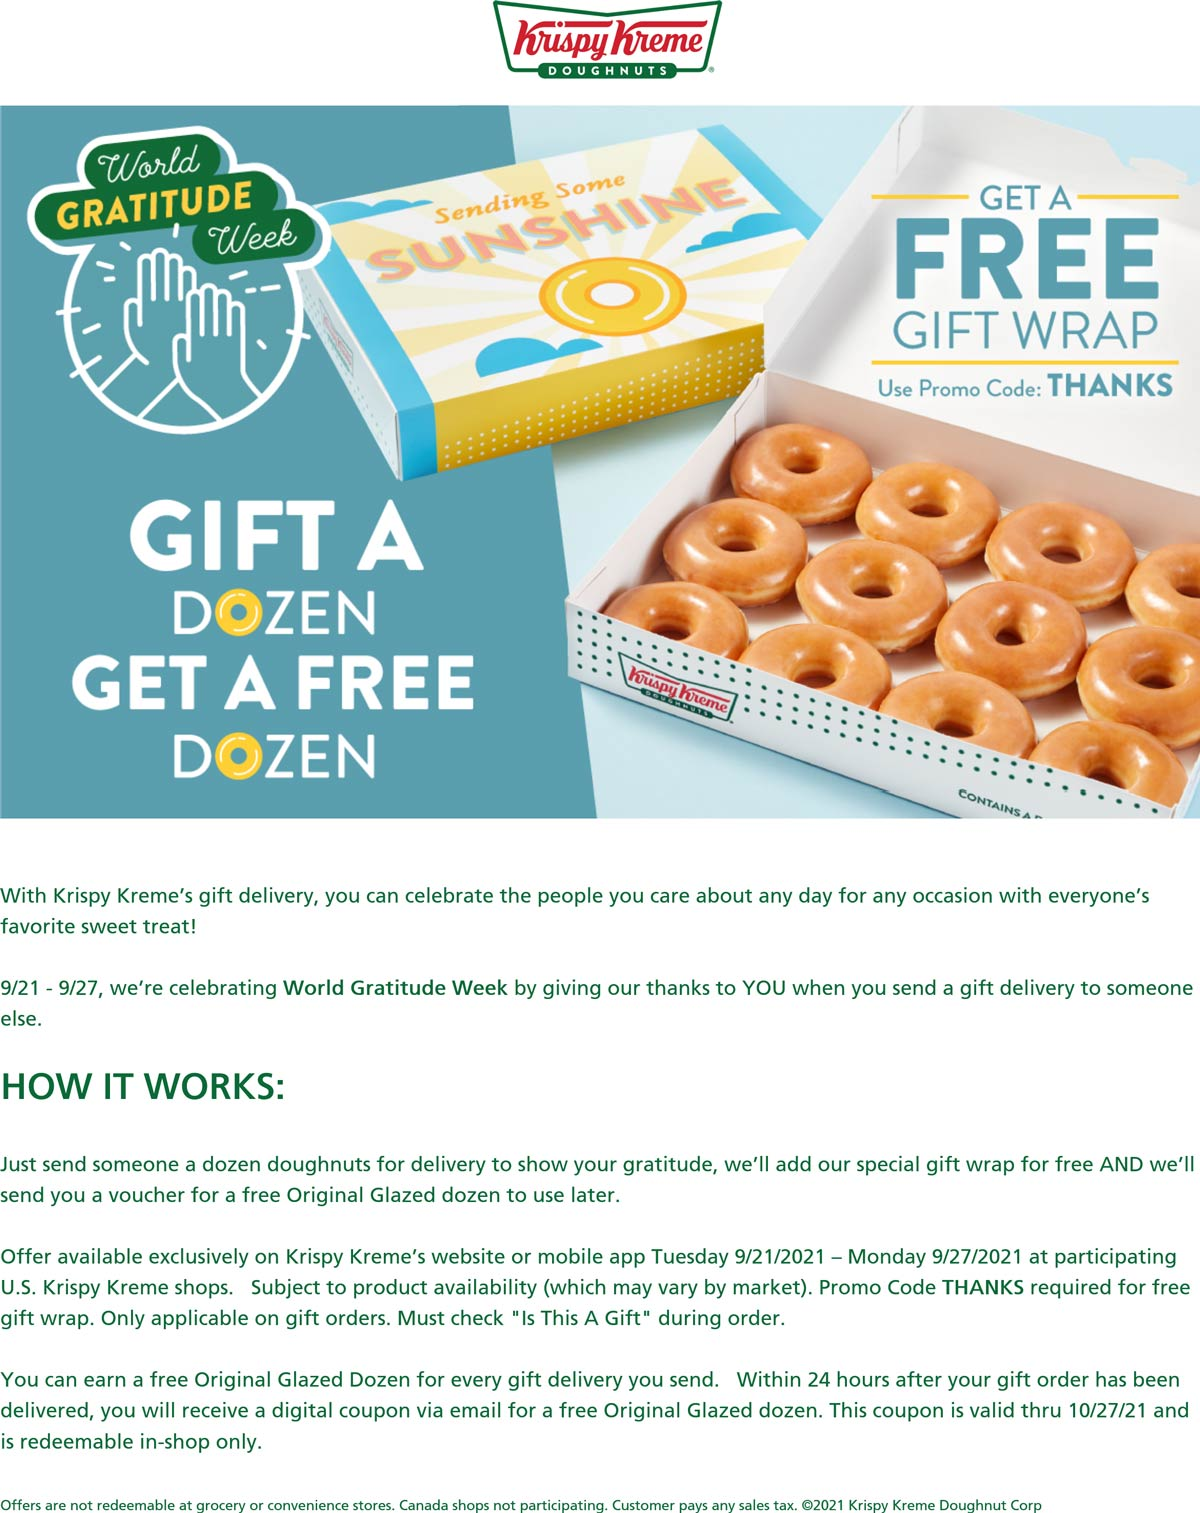 Krispy Kreme restaurants Coupon  Gift a dozen doughnuts get a free dozen at Krispy Kreme via promo code THANKS #krispykreme